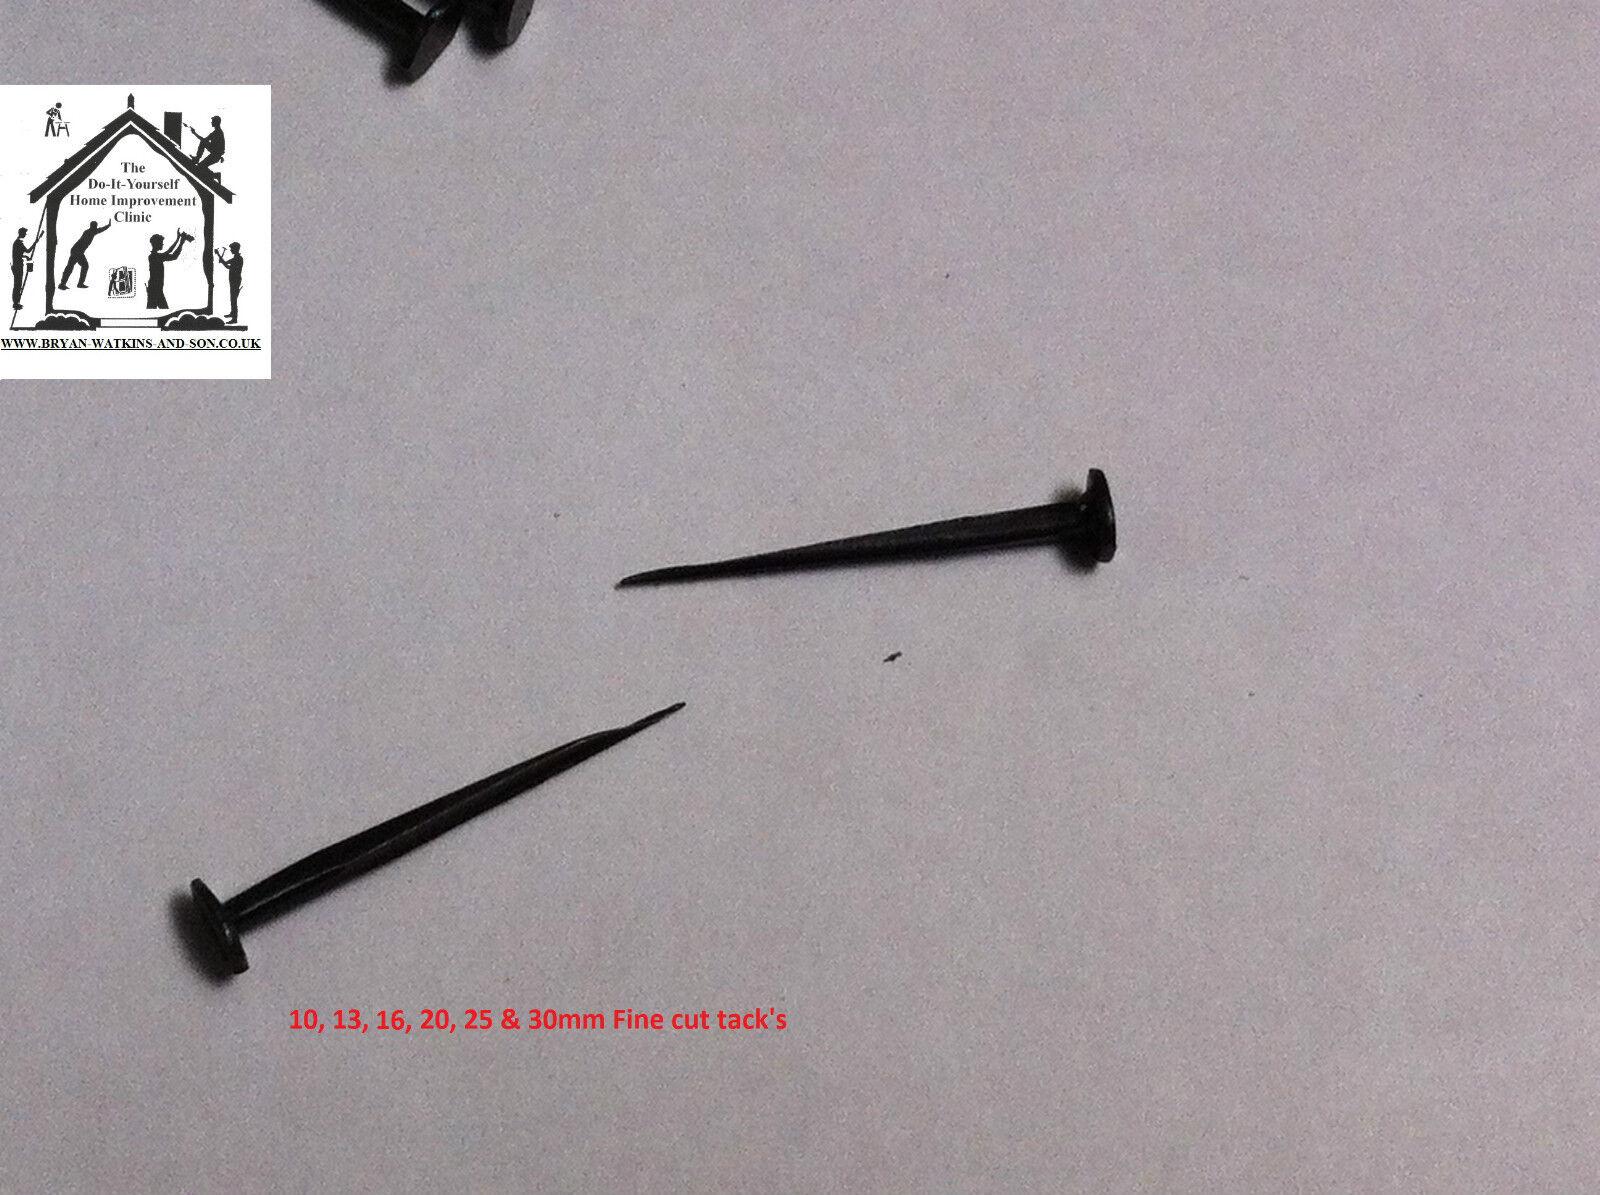 Upholstery tacks Blued cut tacks 10mm,13mm,15mm,20mm,25mm fine or improved.